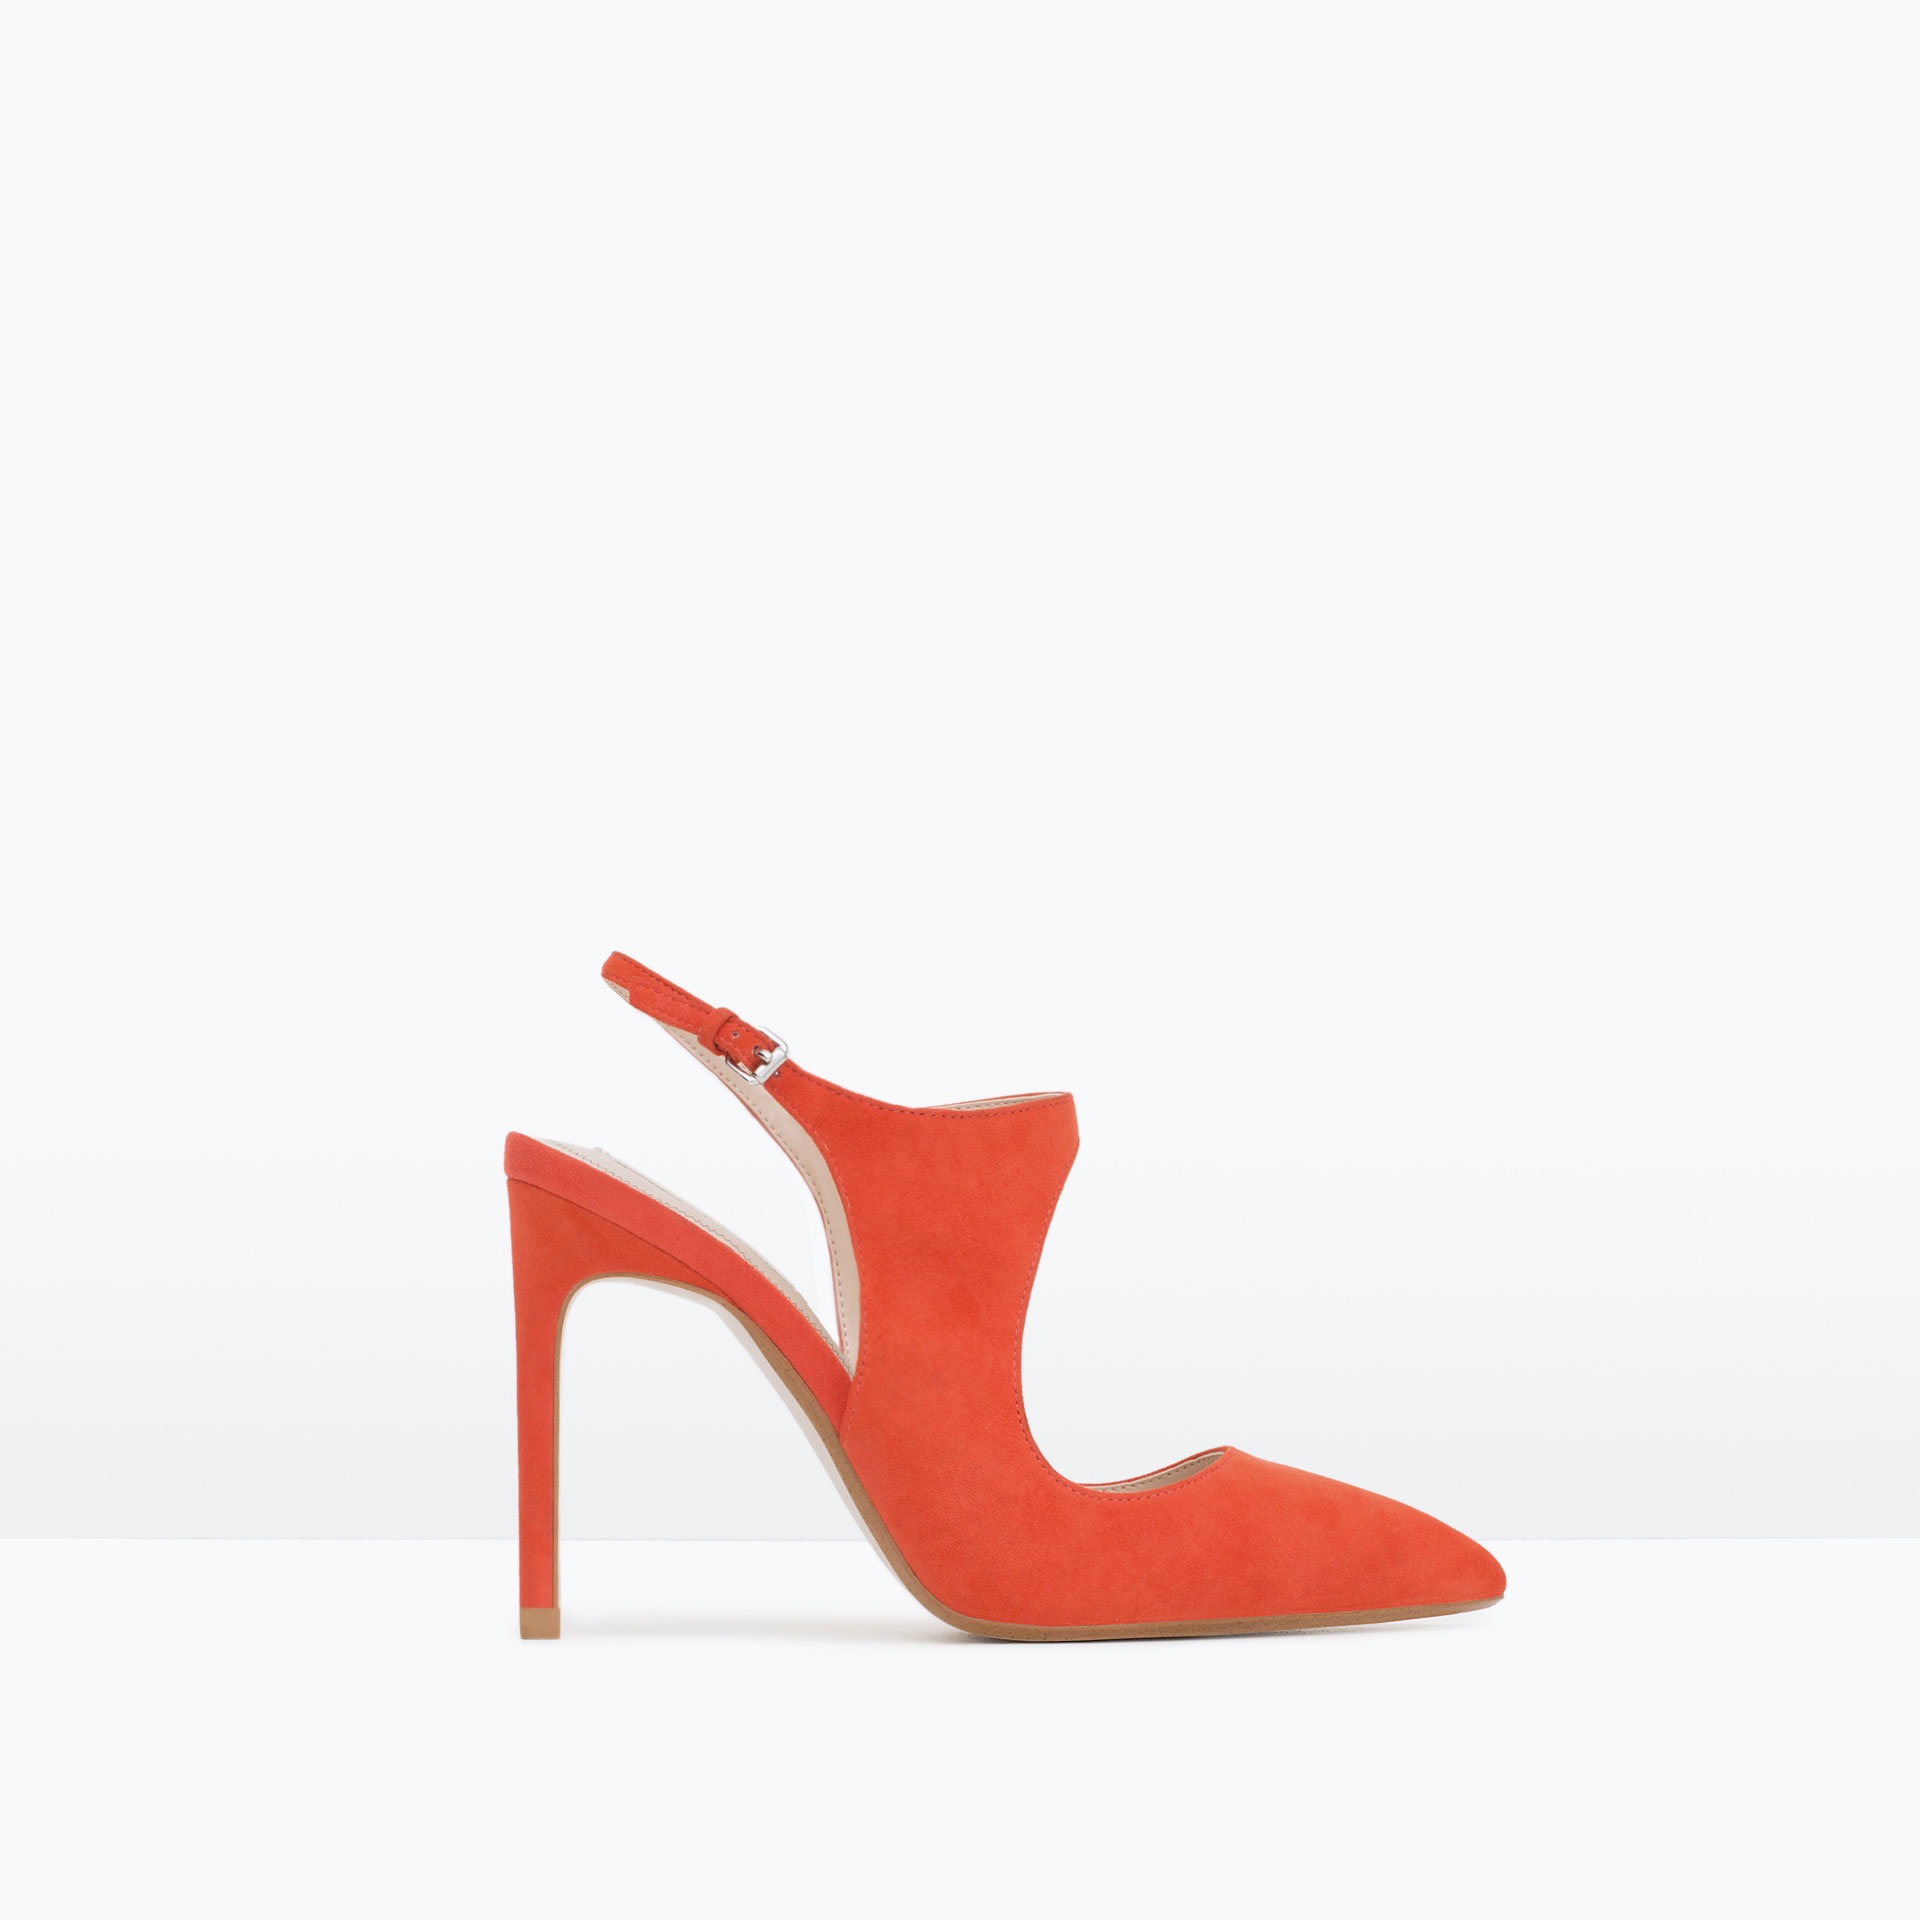 zara suede slingback high heel shoes in orange lyst